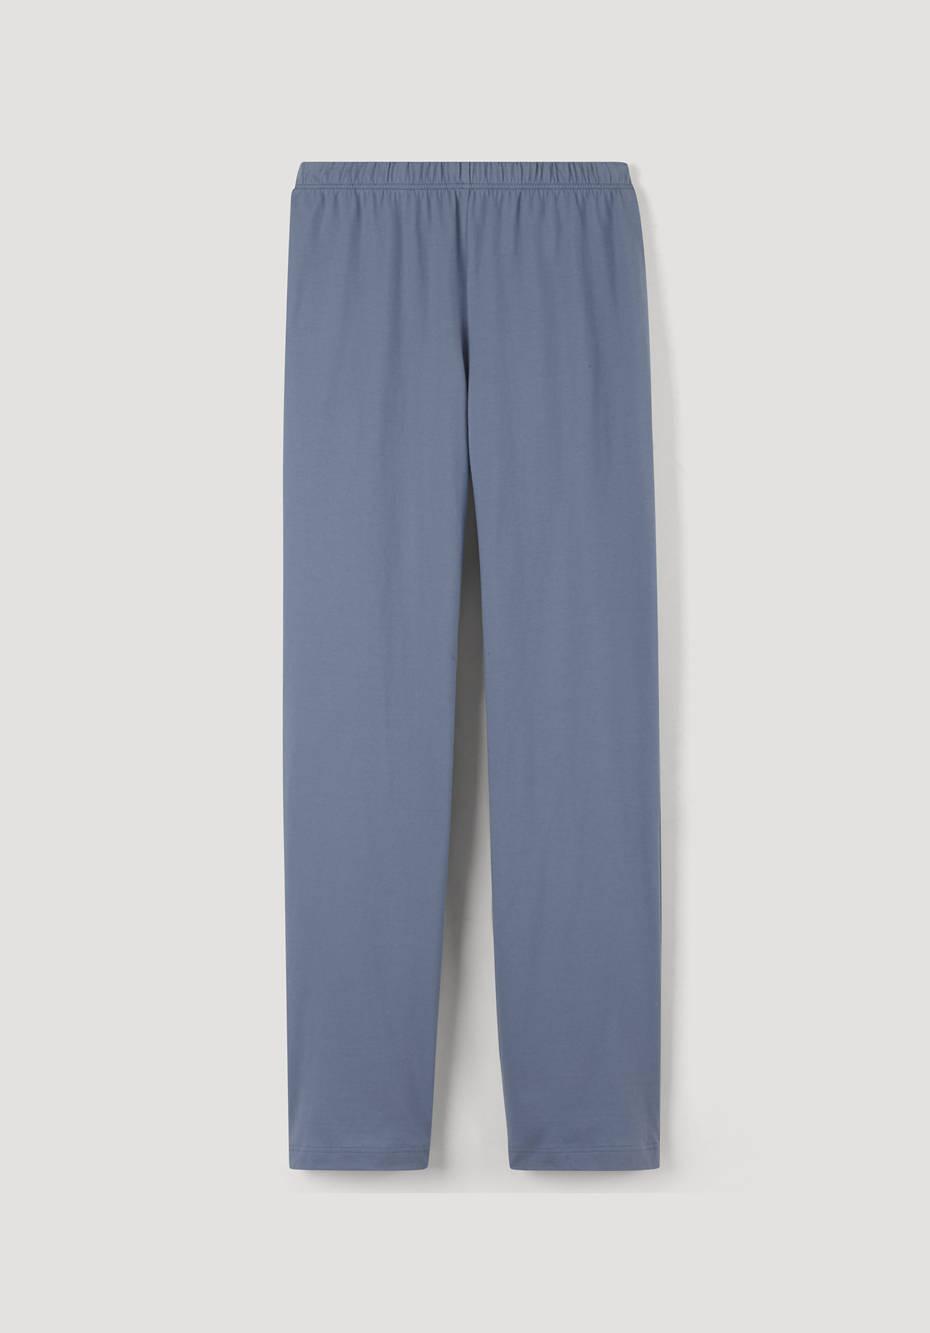 Long pajamas made from pure organic cotton